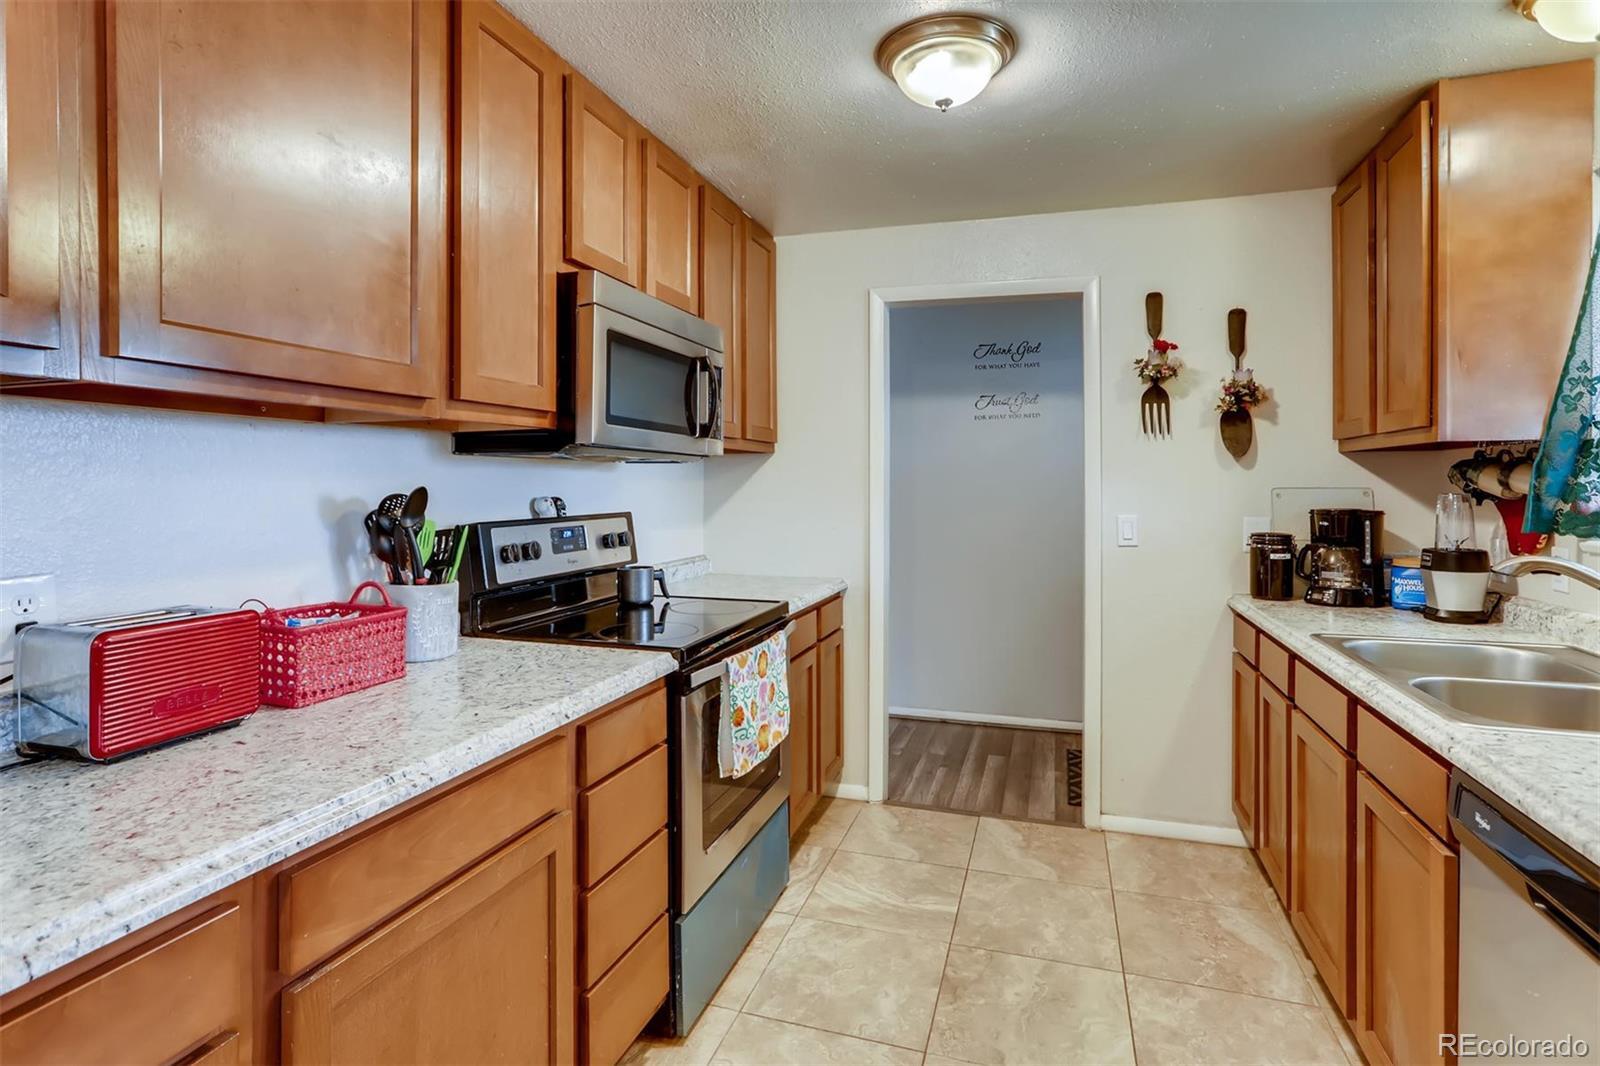 MLS# 7901545 - 5 - 1389 Douglas Drive, Denver, CO 80221